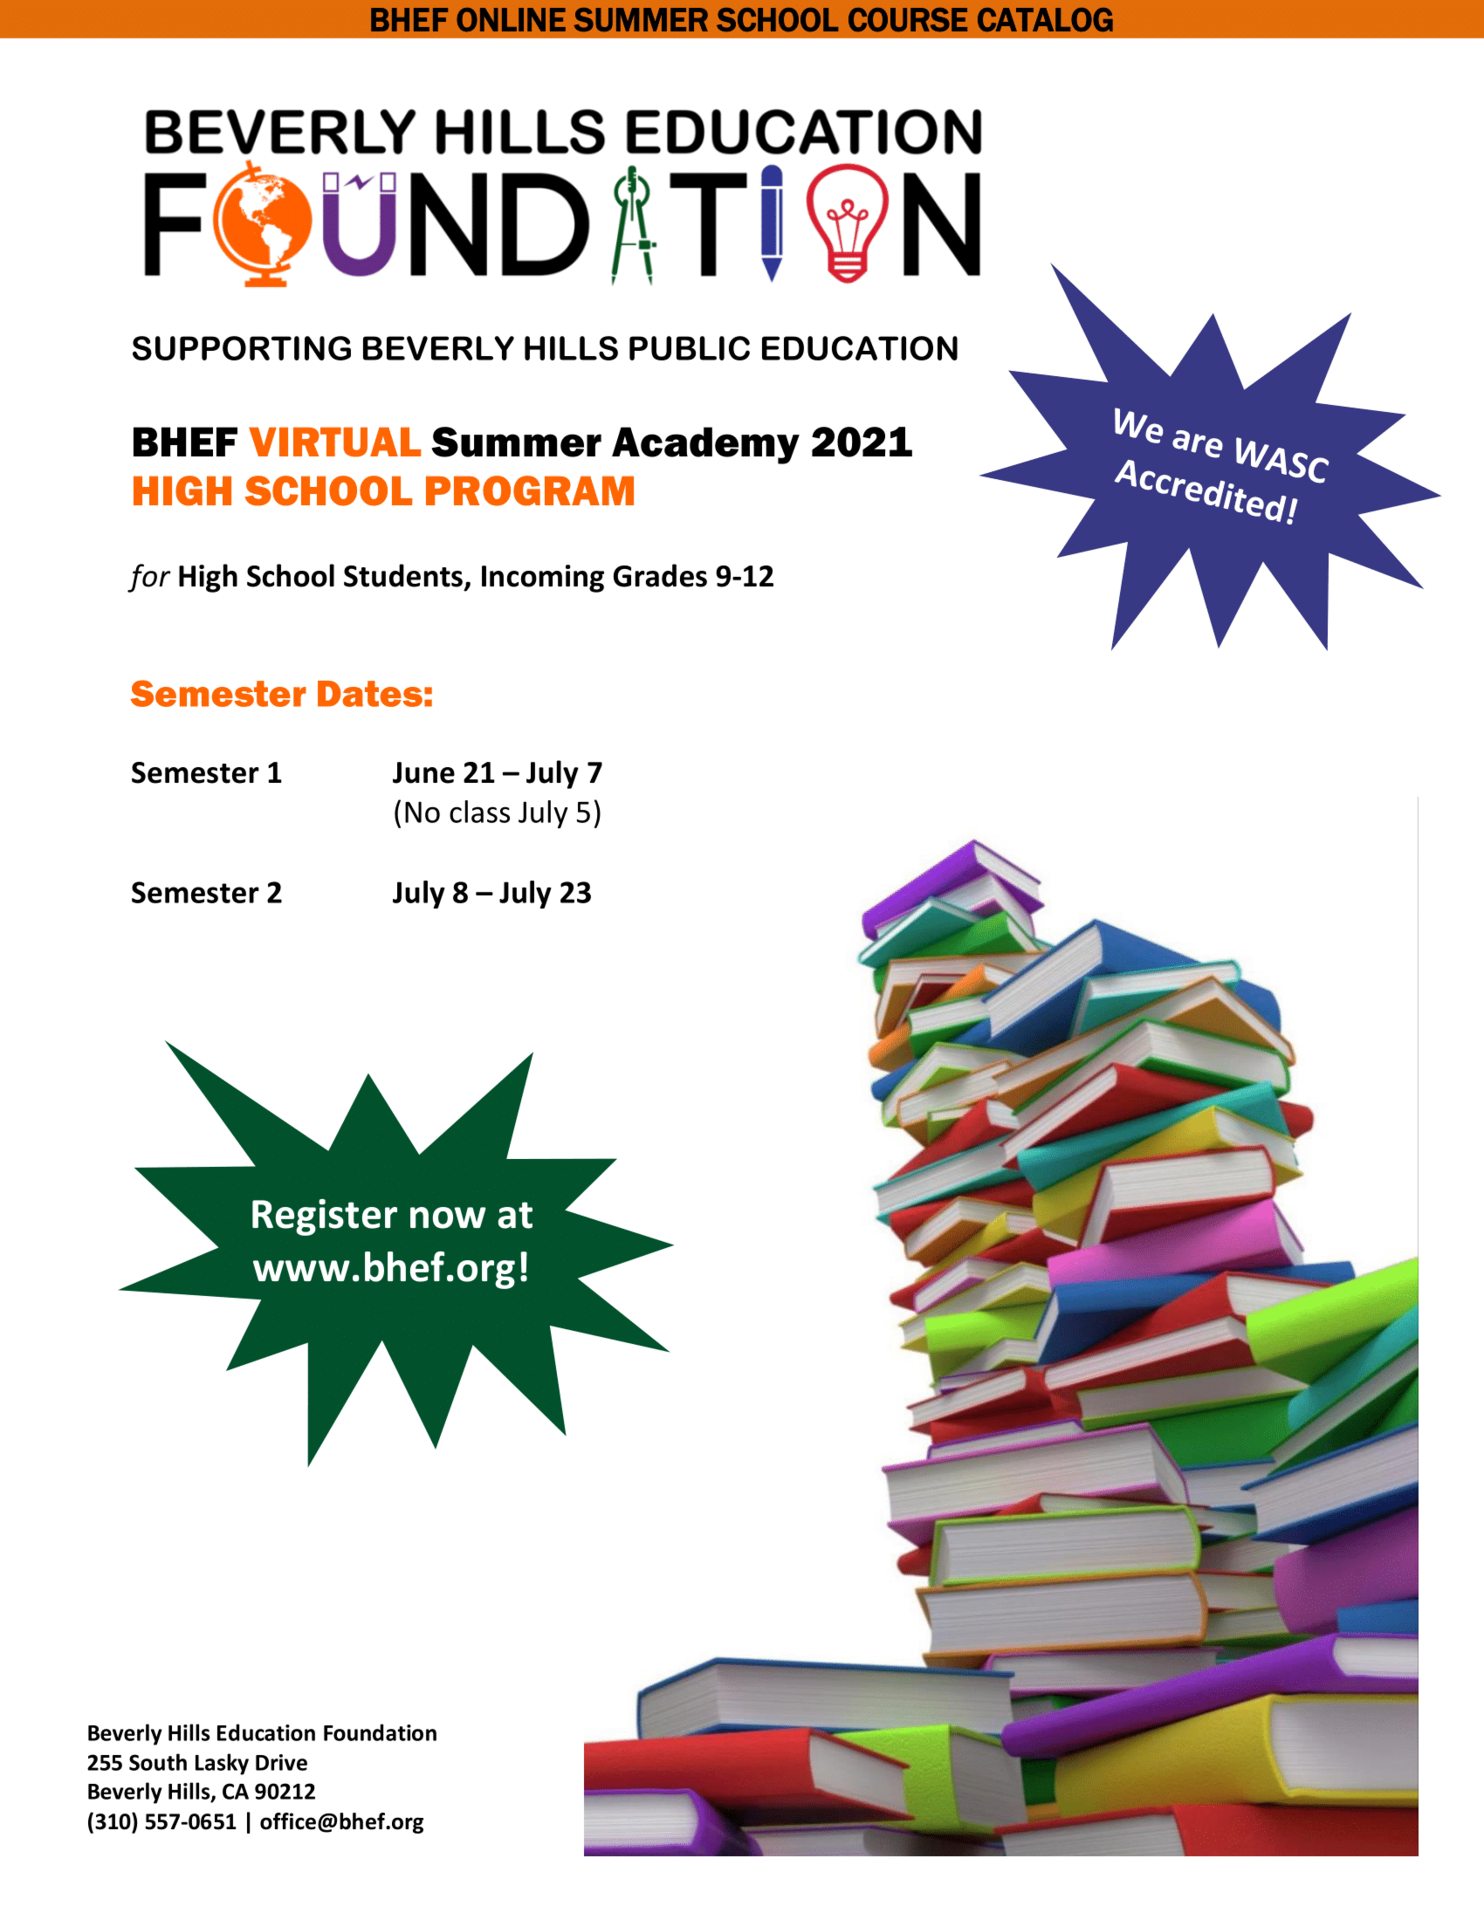 HS Summer Academy Course Catalog